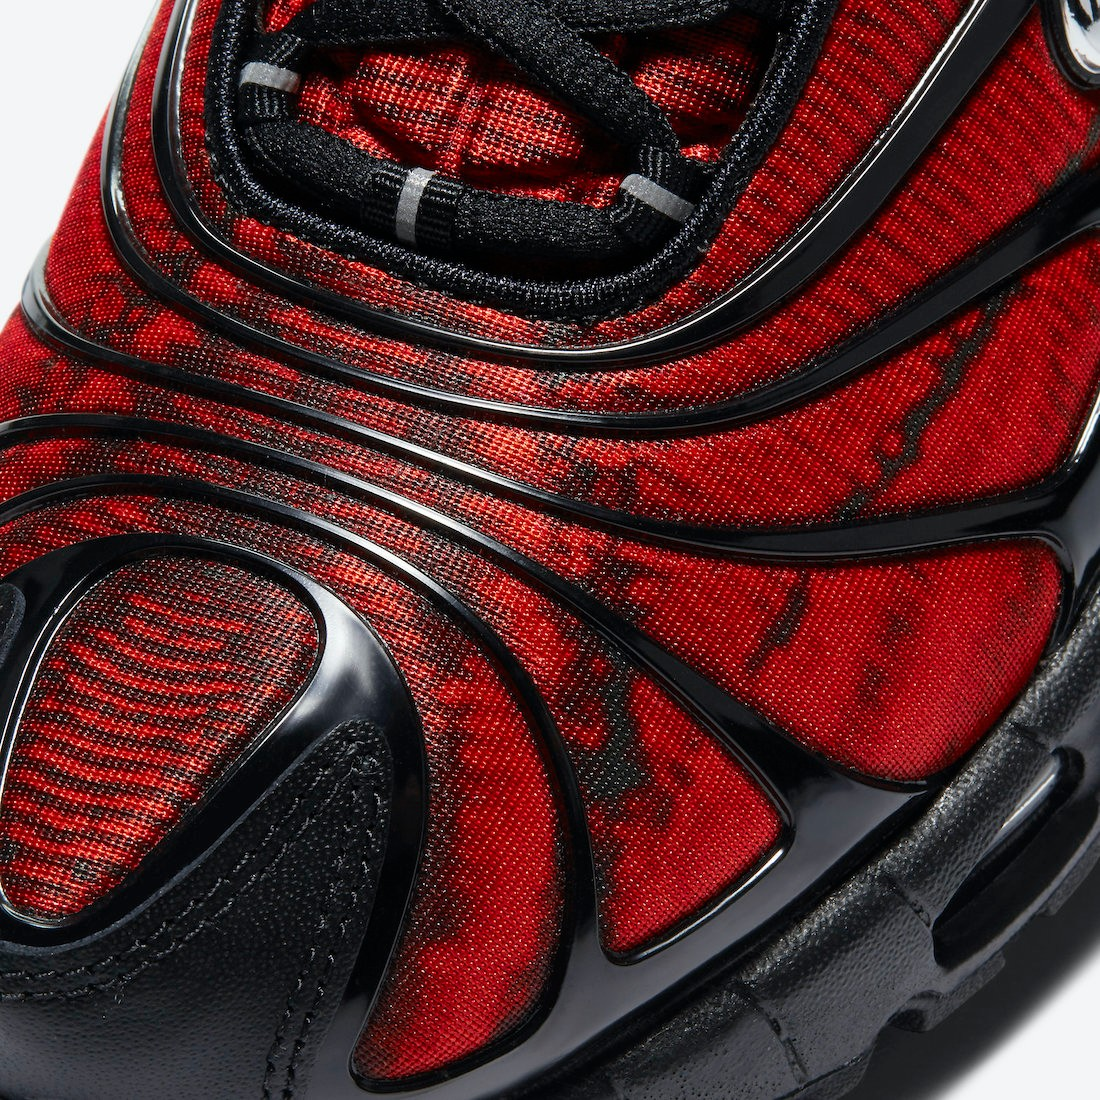 Nike,Skepta,Air Max Tailwind 5  黑红配色!全新 Air Max Tailwind 5 即将发售!